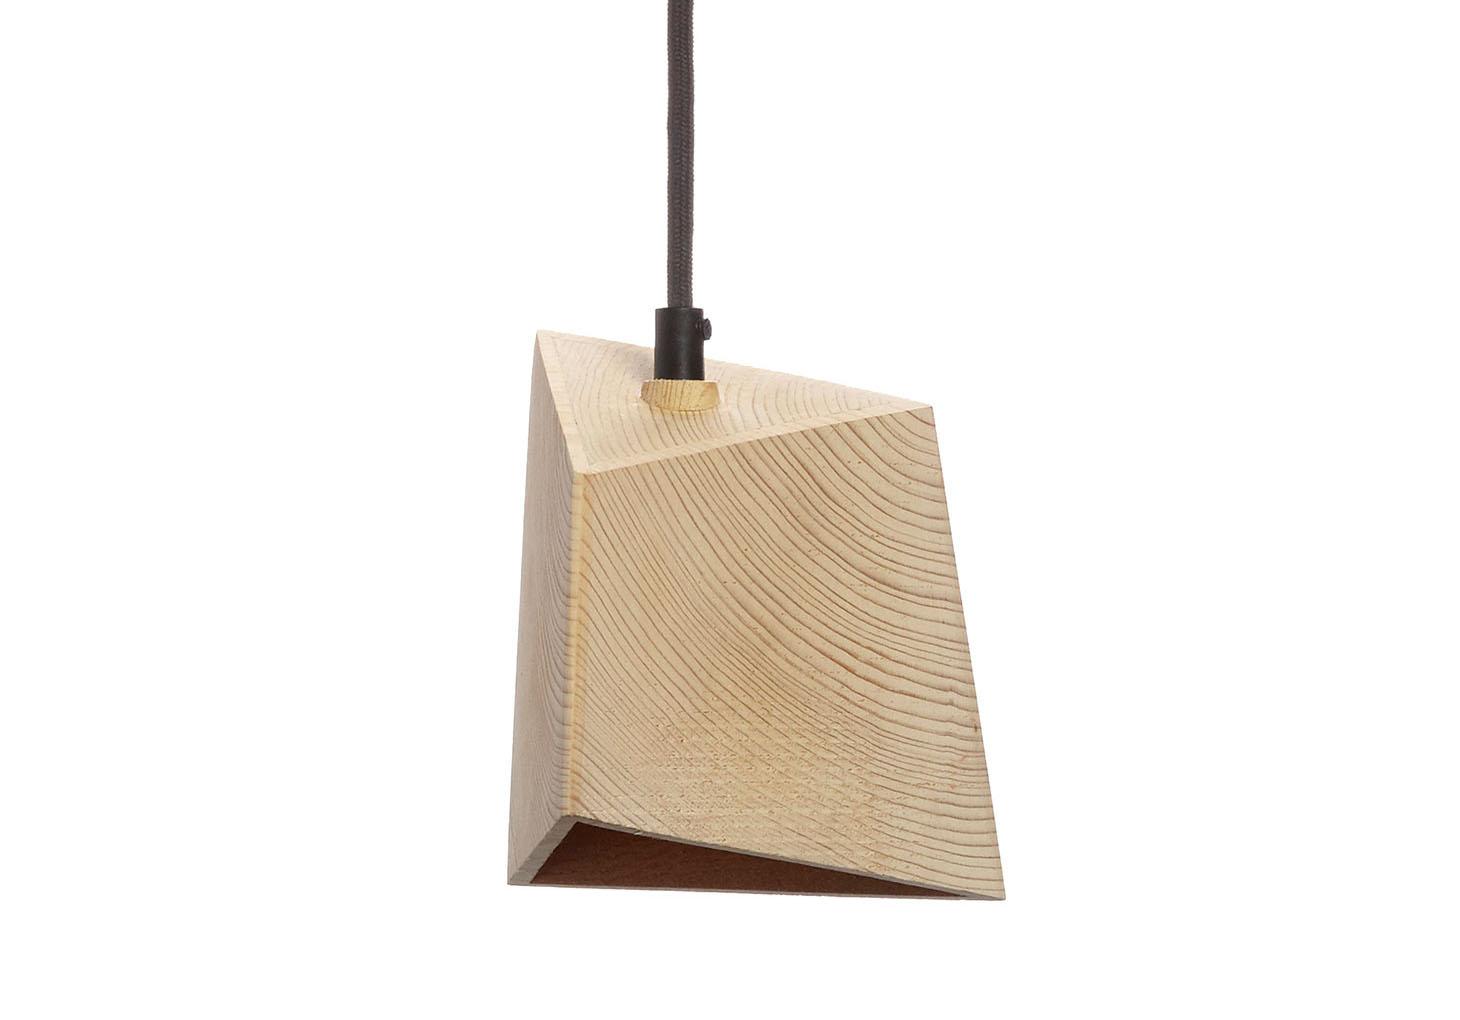 Almleuchten - Design Lighting made of Old Timber